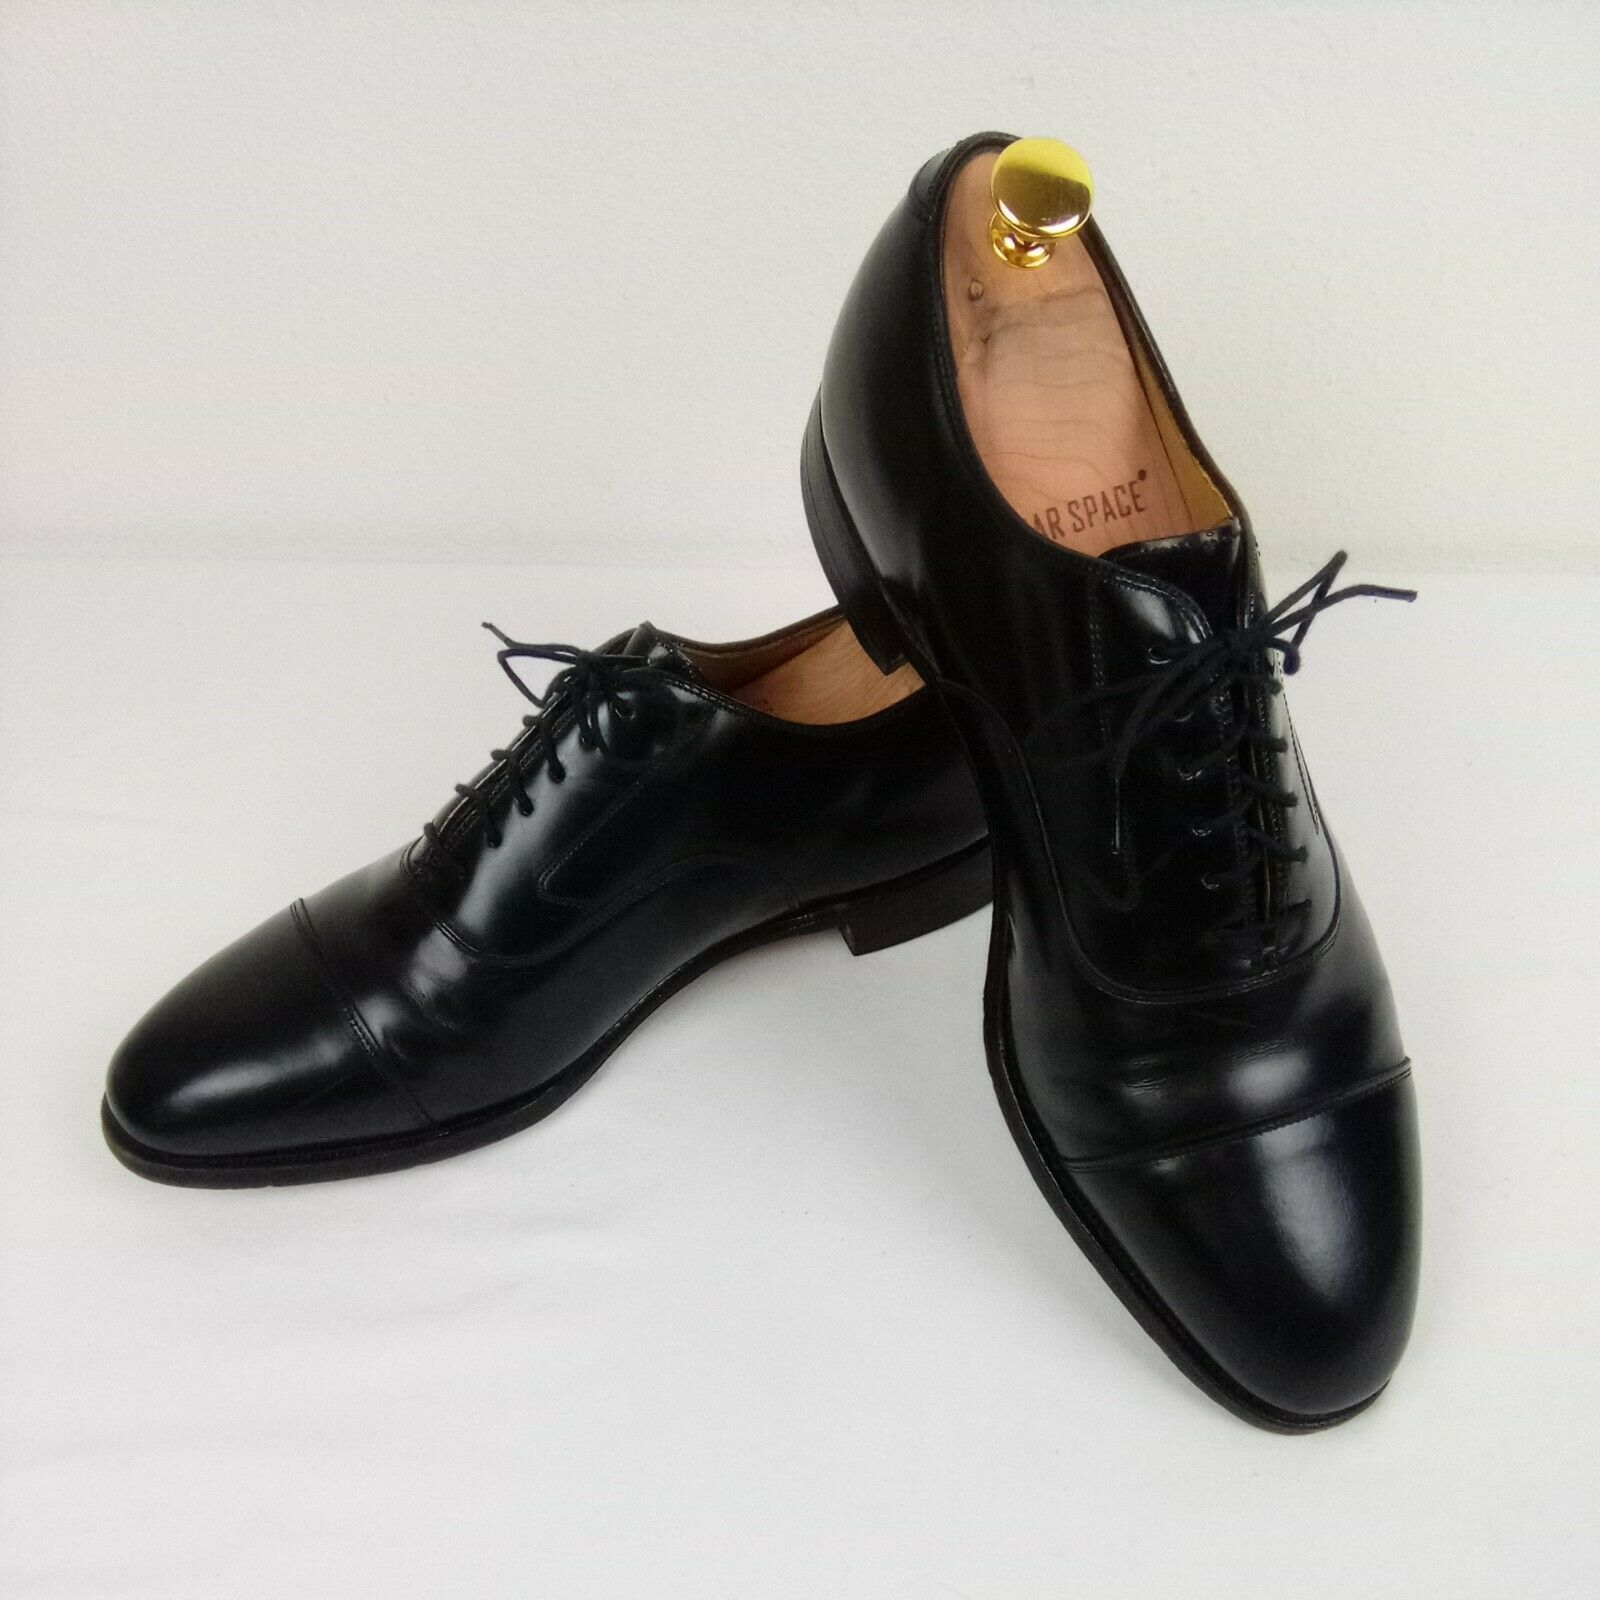 Johnston & Murphy Optima Men's Black Leather Cap Toe Lace Up Oxfords 10.5 D/B